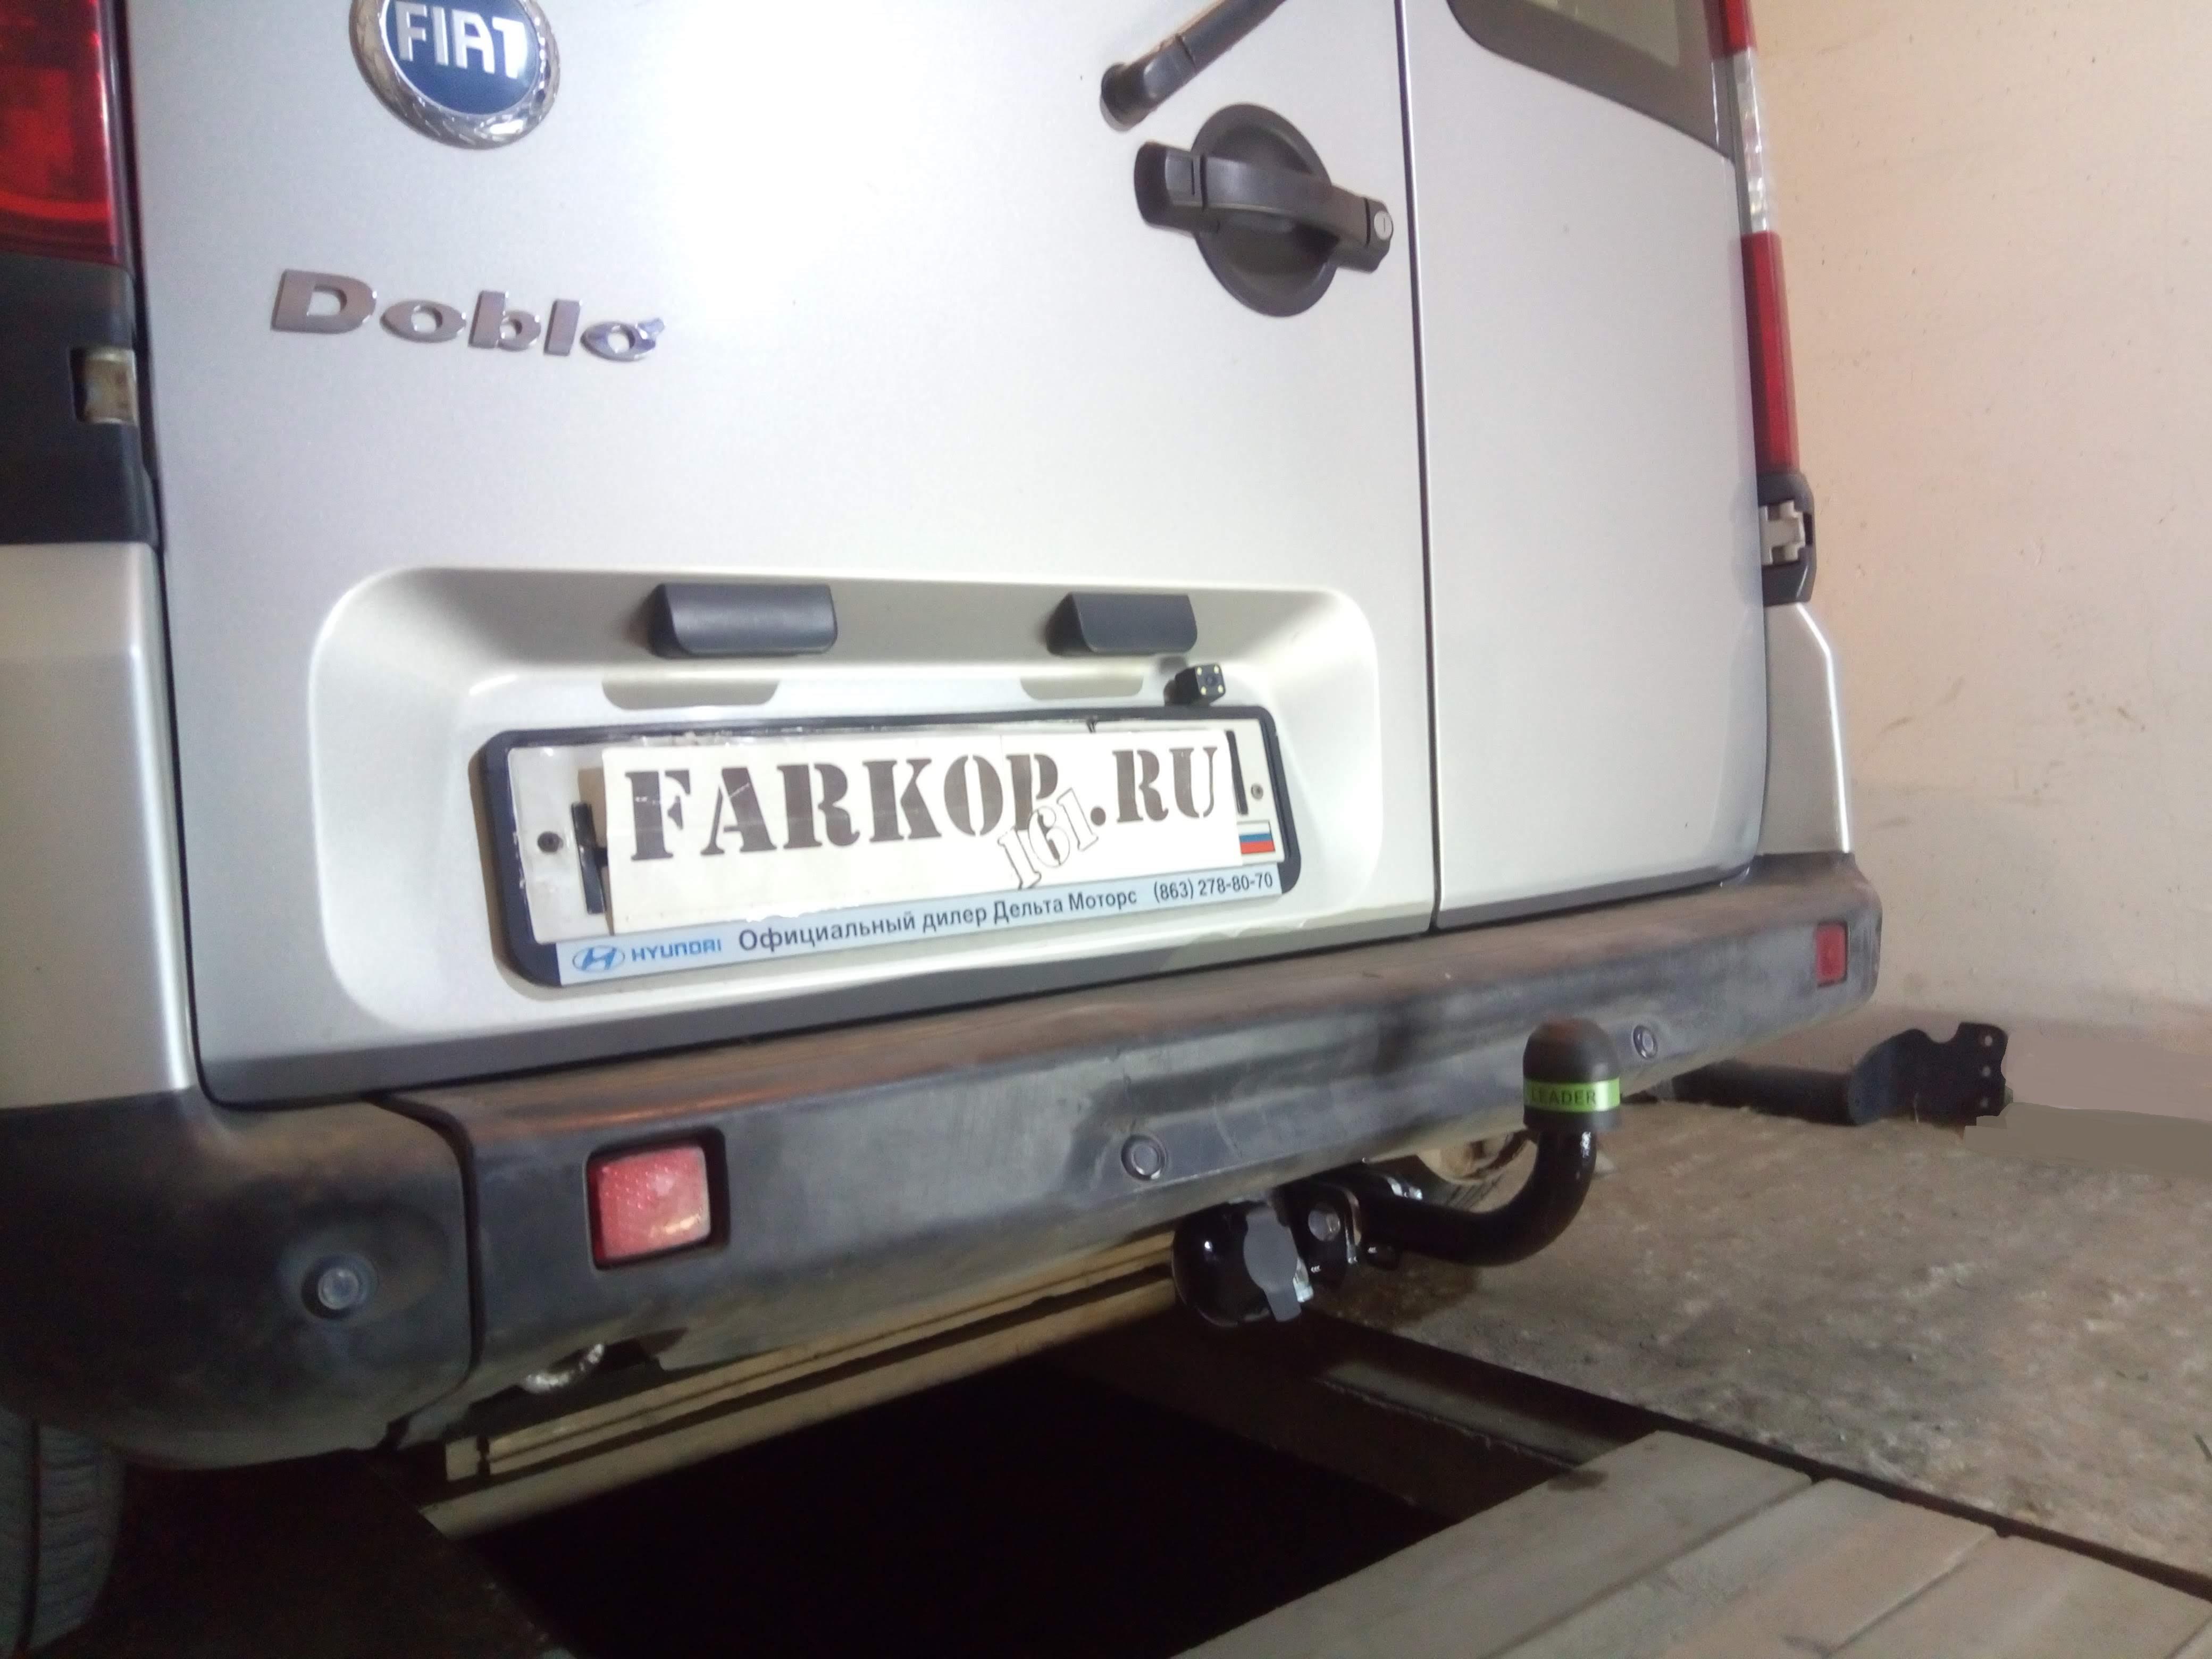 Фаркоп F203-A для FIAT DOBLO 2001-2010. Leader-Plus